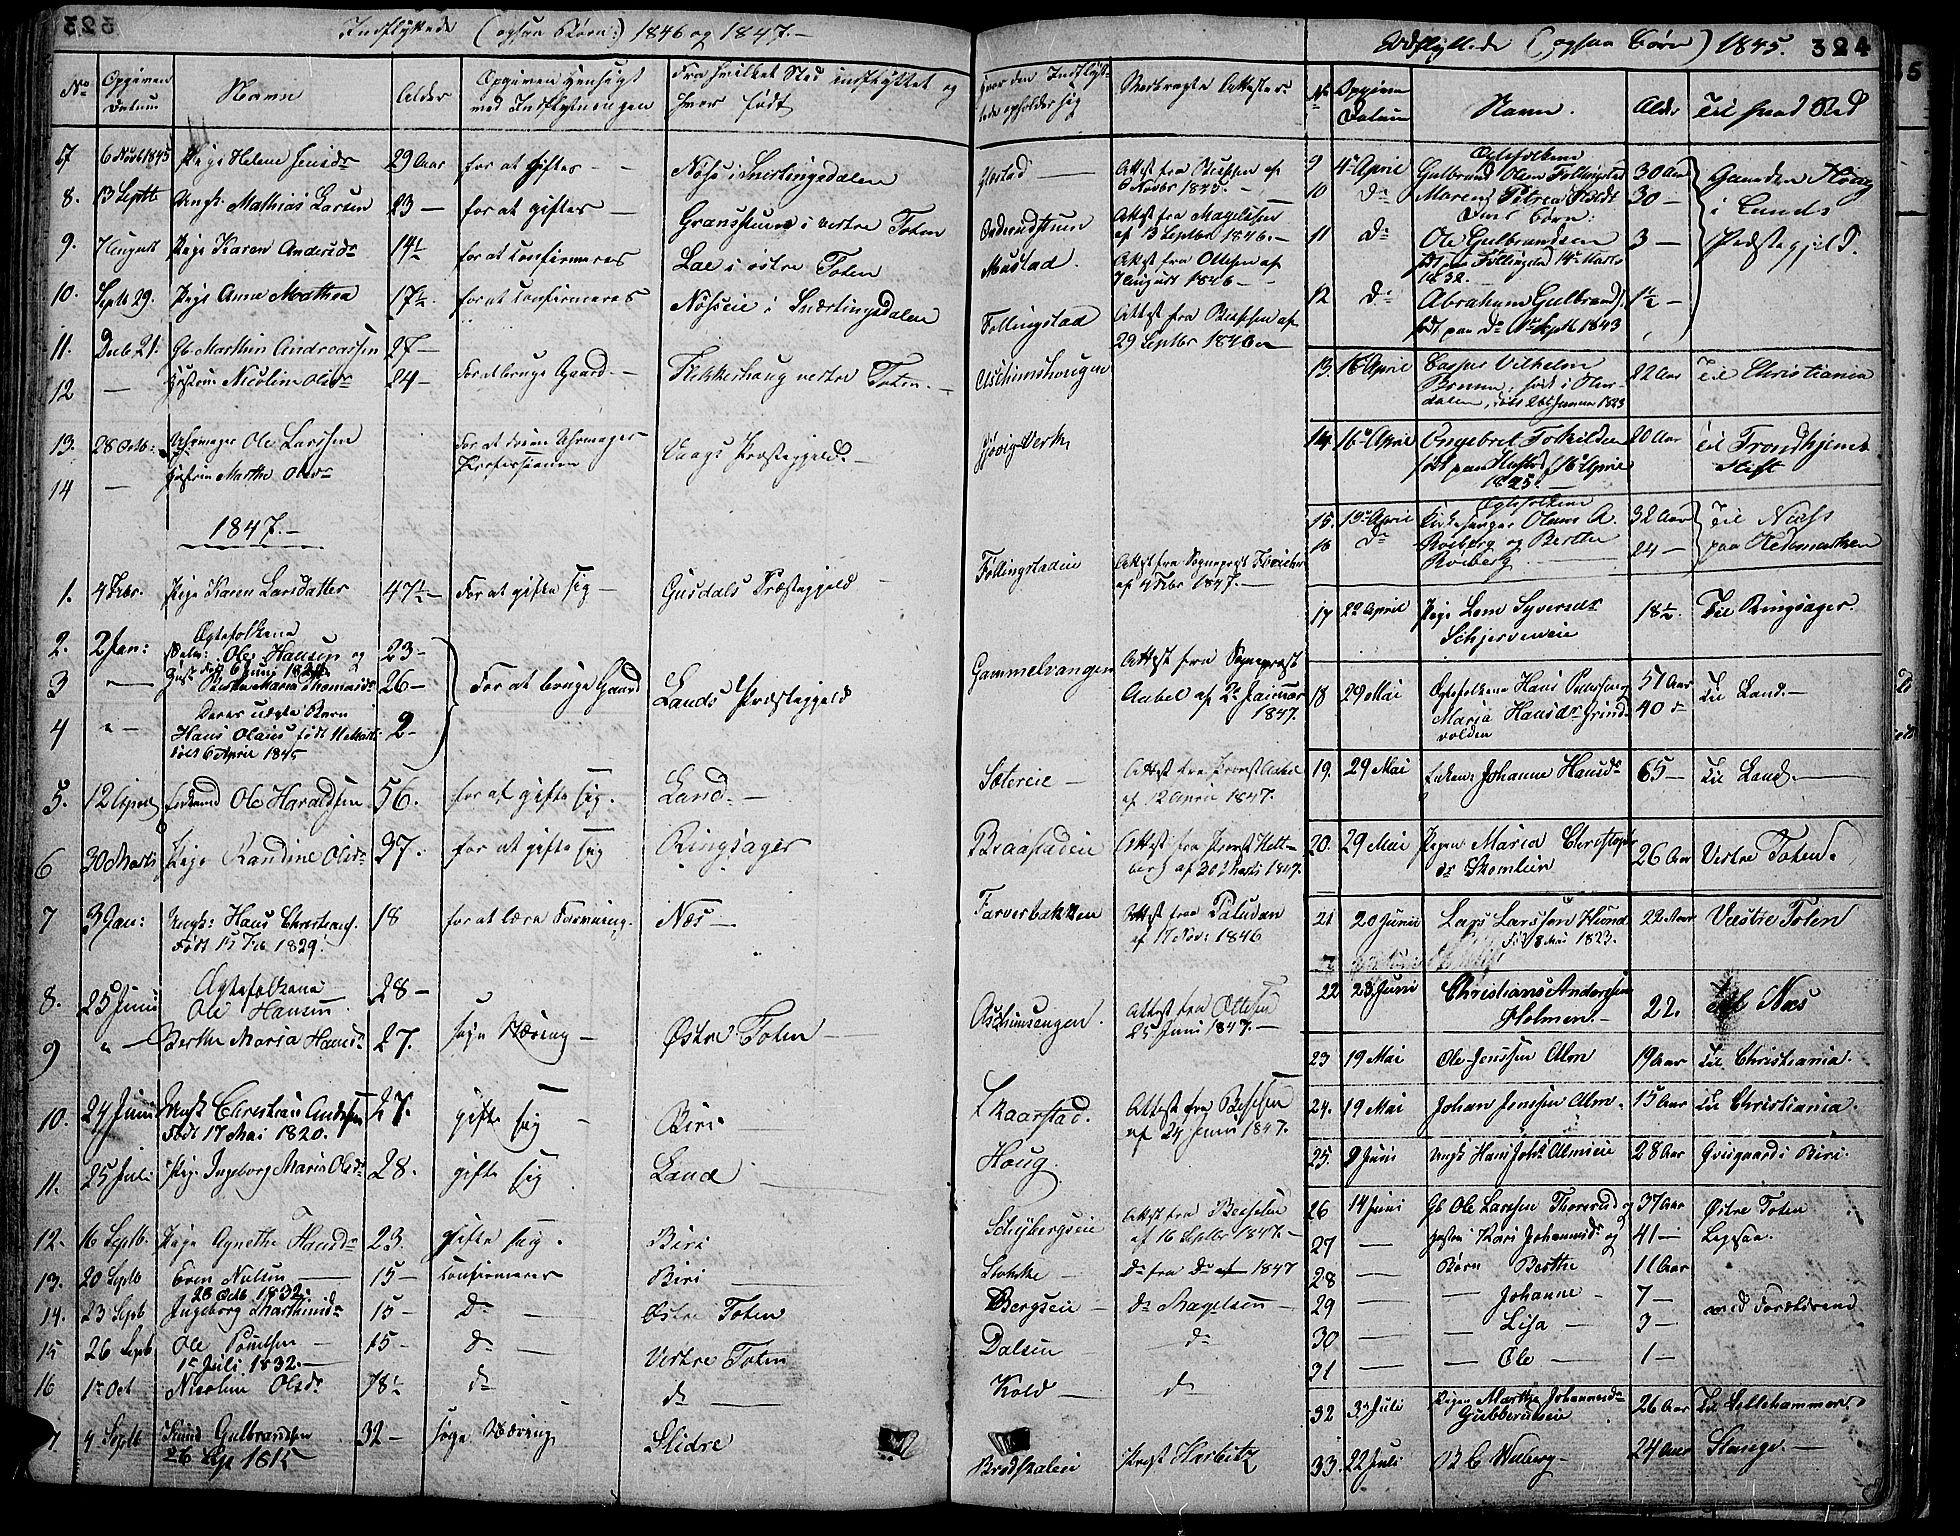 SAH, Vardal prestekontor, H/Ha/Hab/L0004: Klokkerbok nr. 4, 1831-1853, s. 324